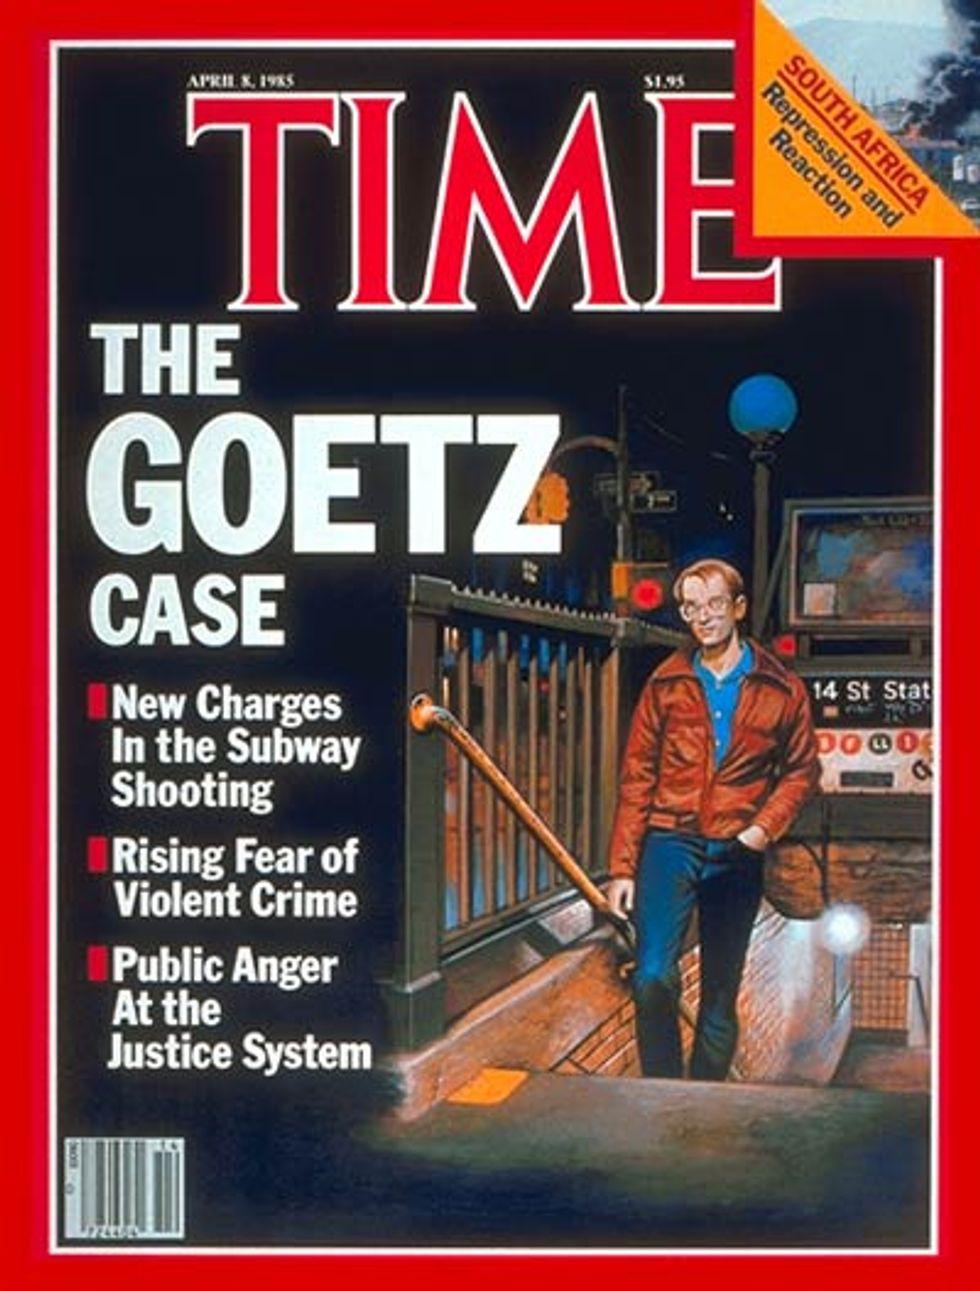 Me, Bernard Goetz and an Elevator.